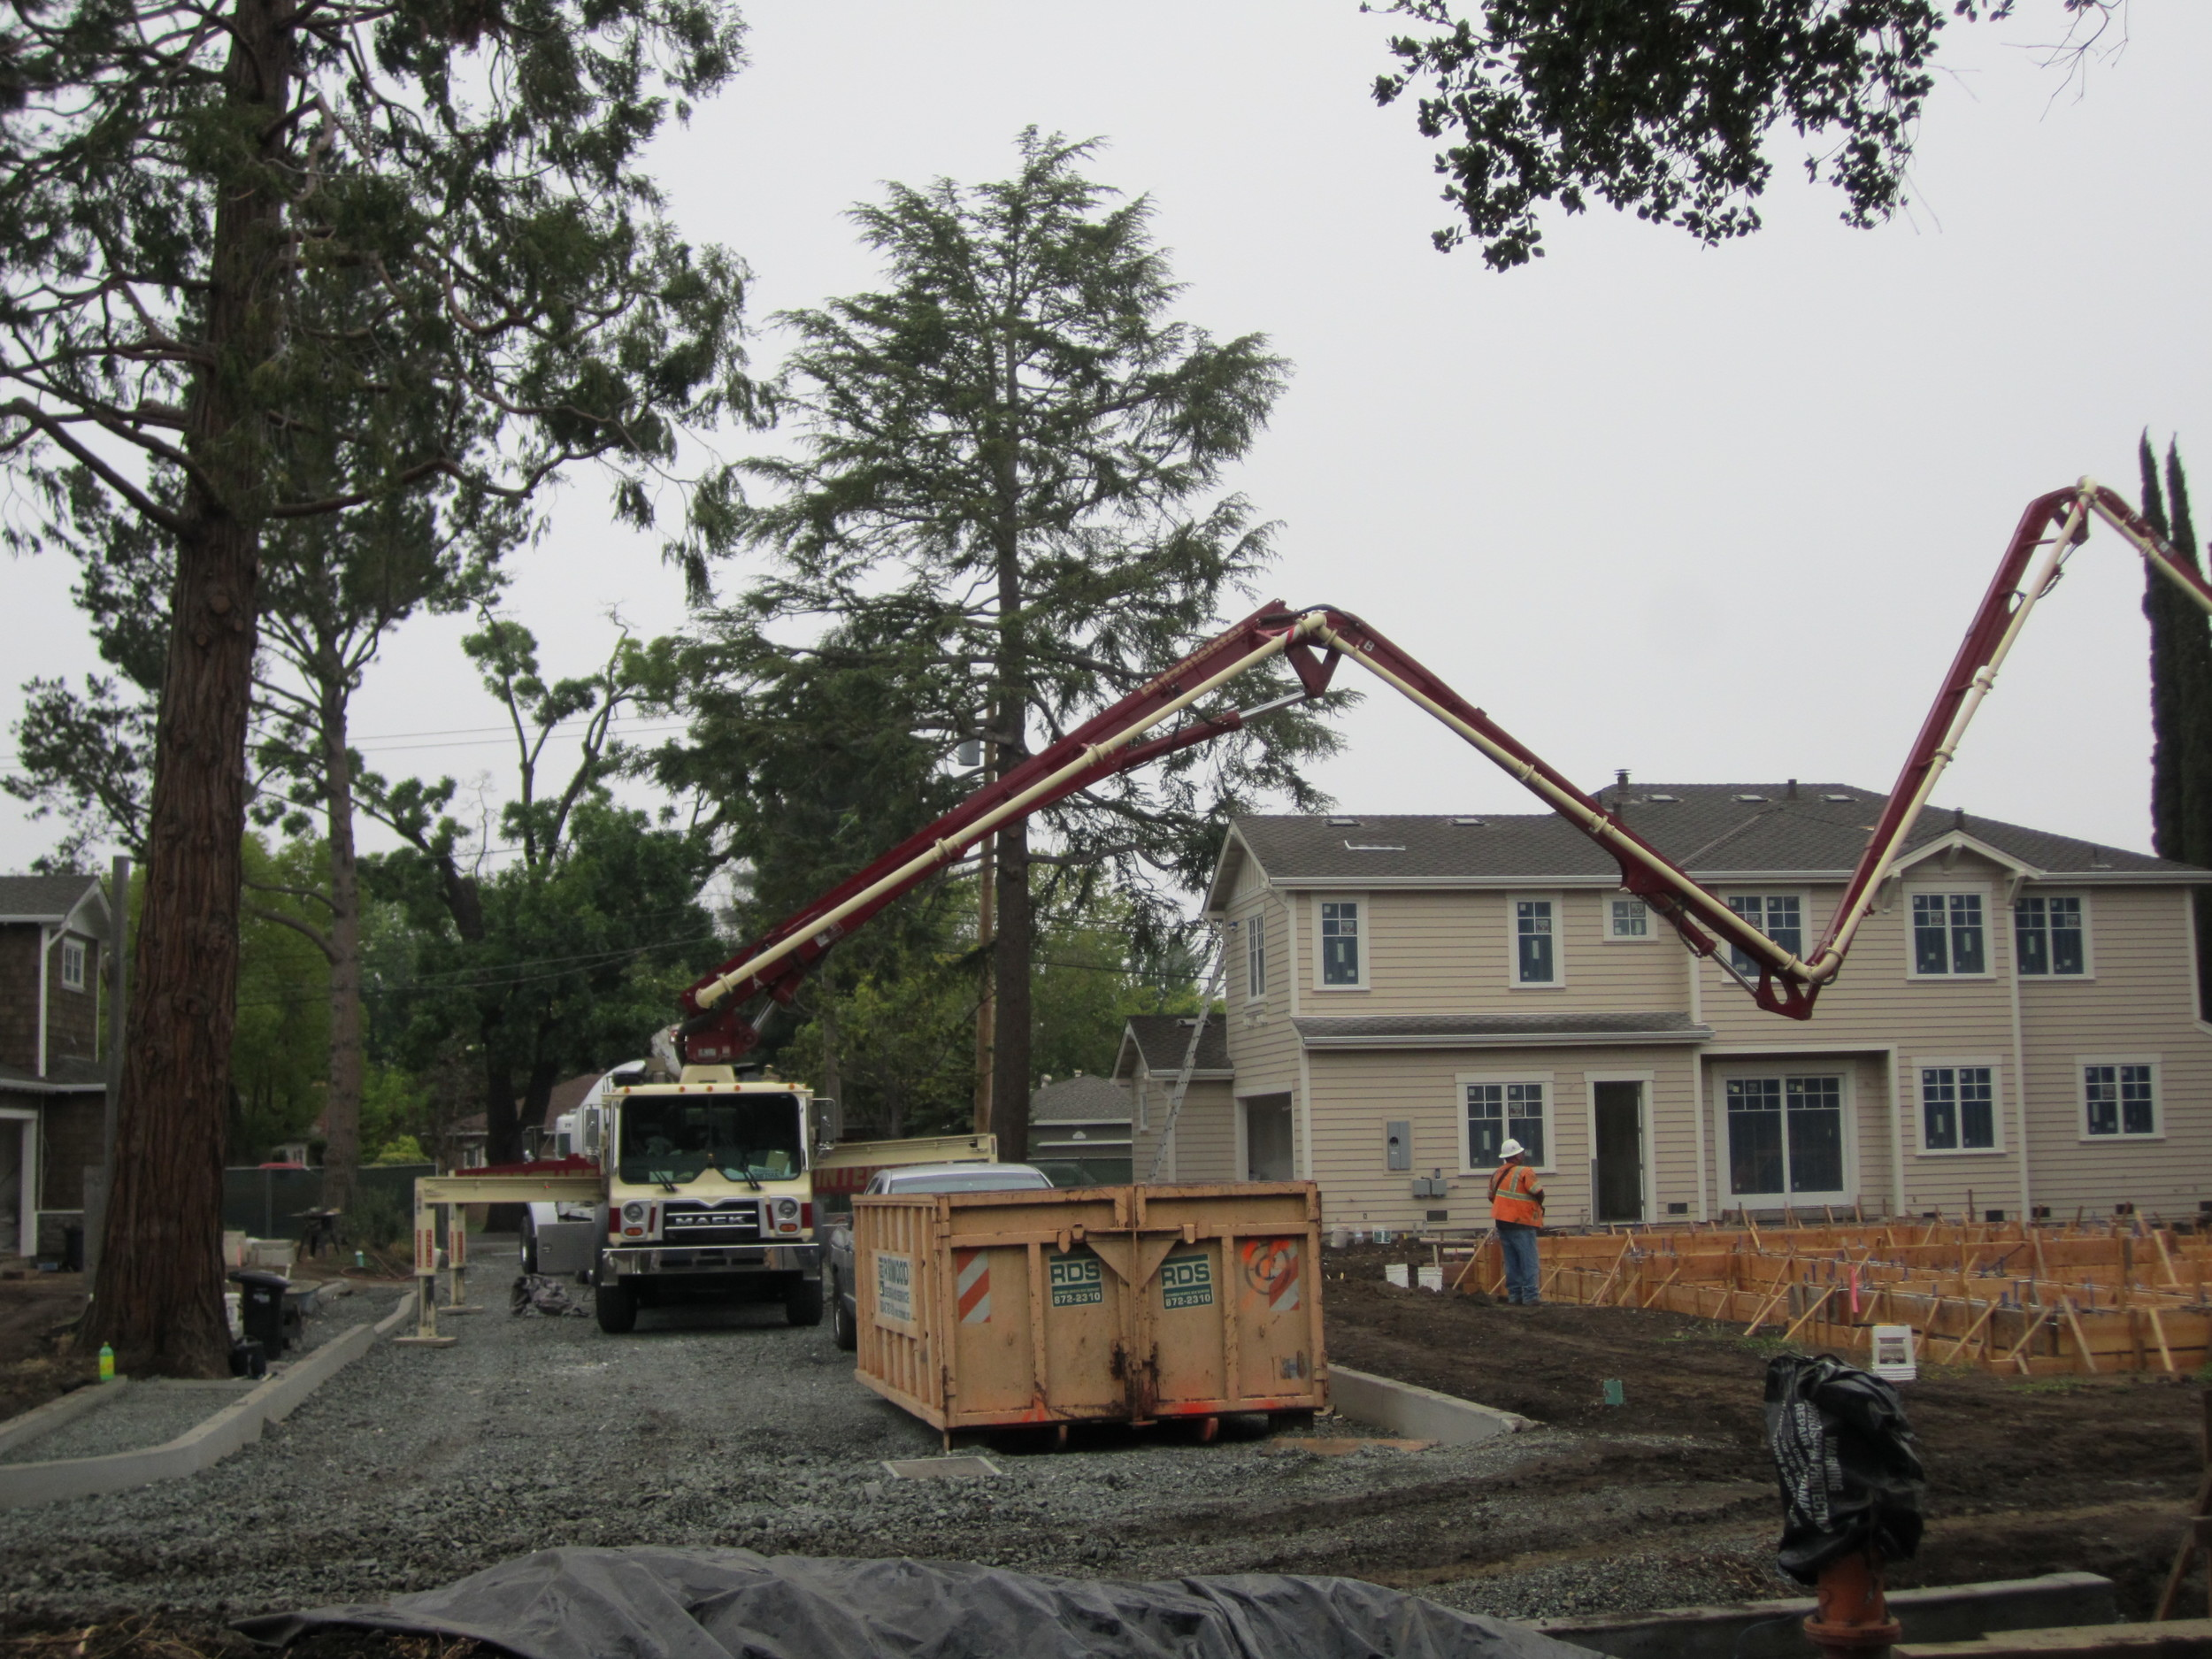 6 home New development Rossi Lane Redwood City